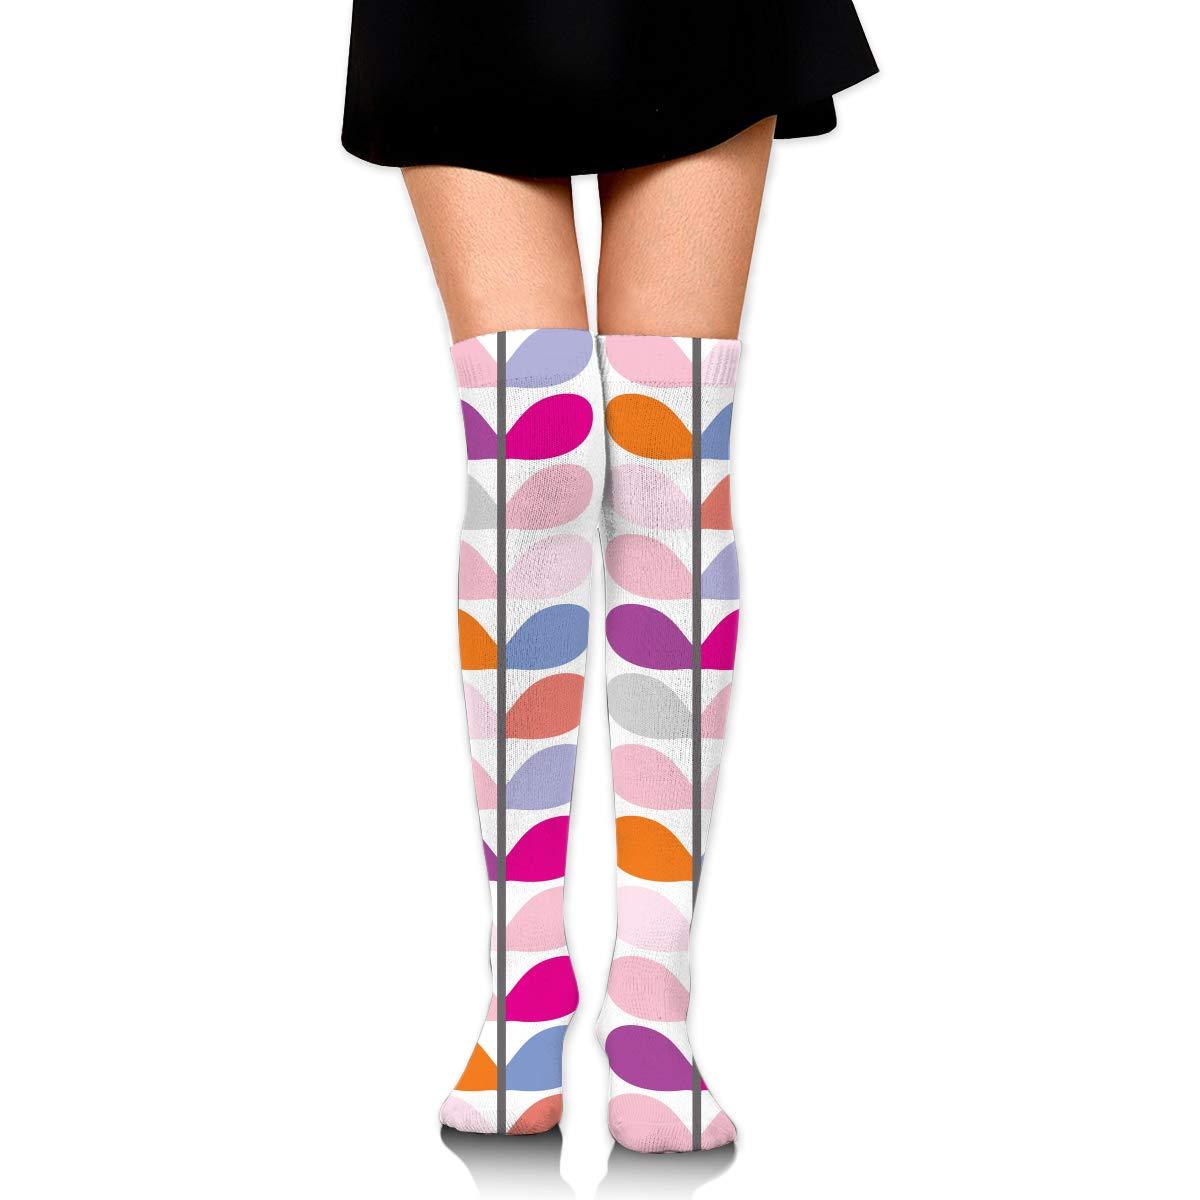 High Elasticity Girl Cotton Knee High Socks Uniform Leaf Pattern Women Tube Socks